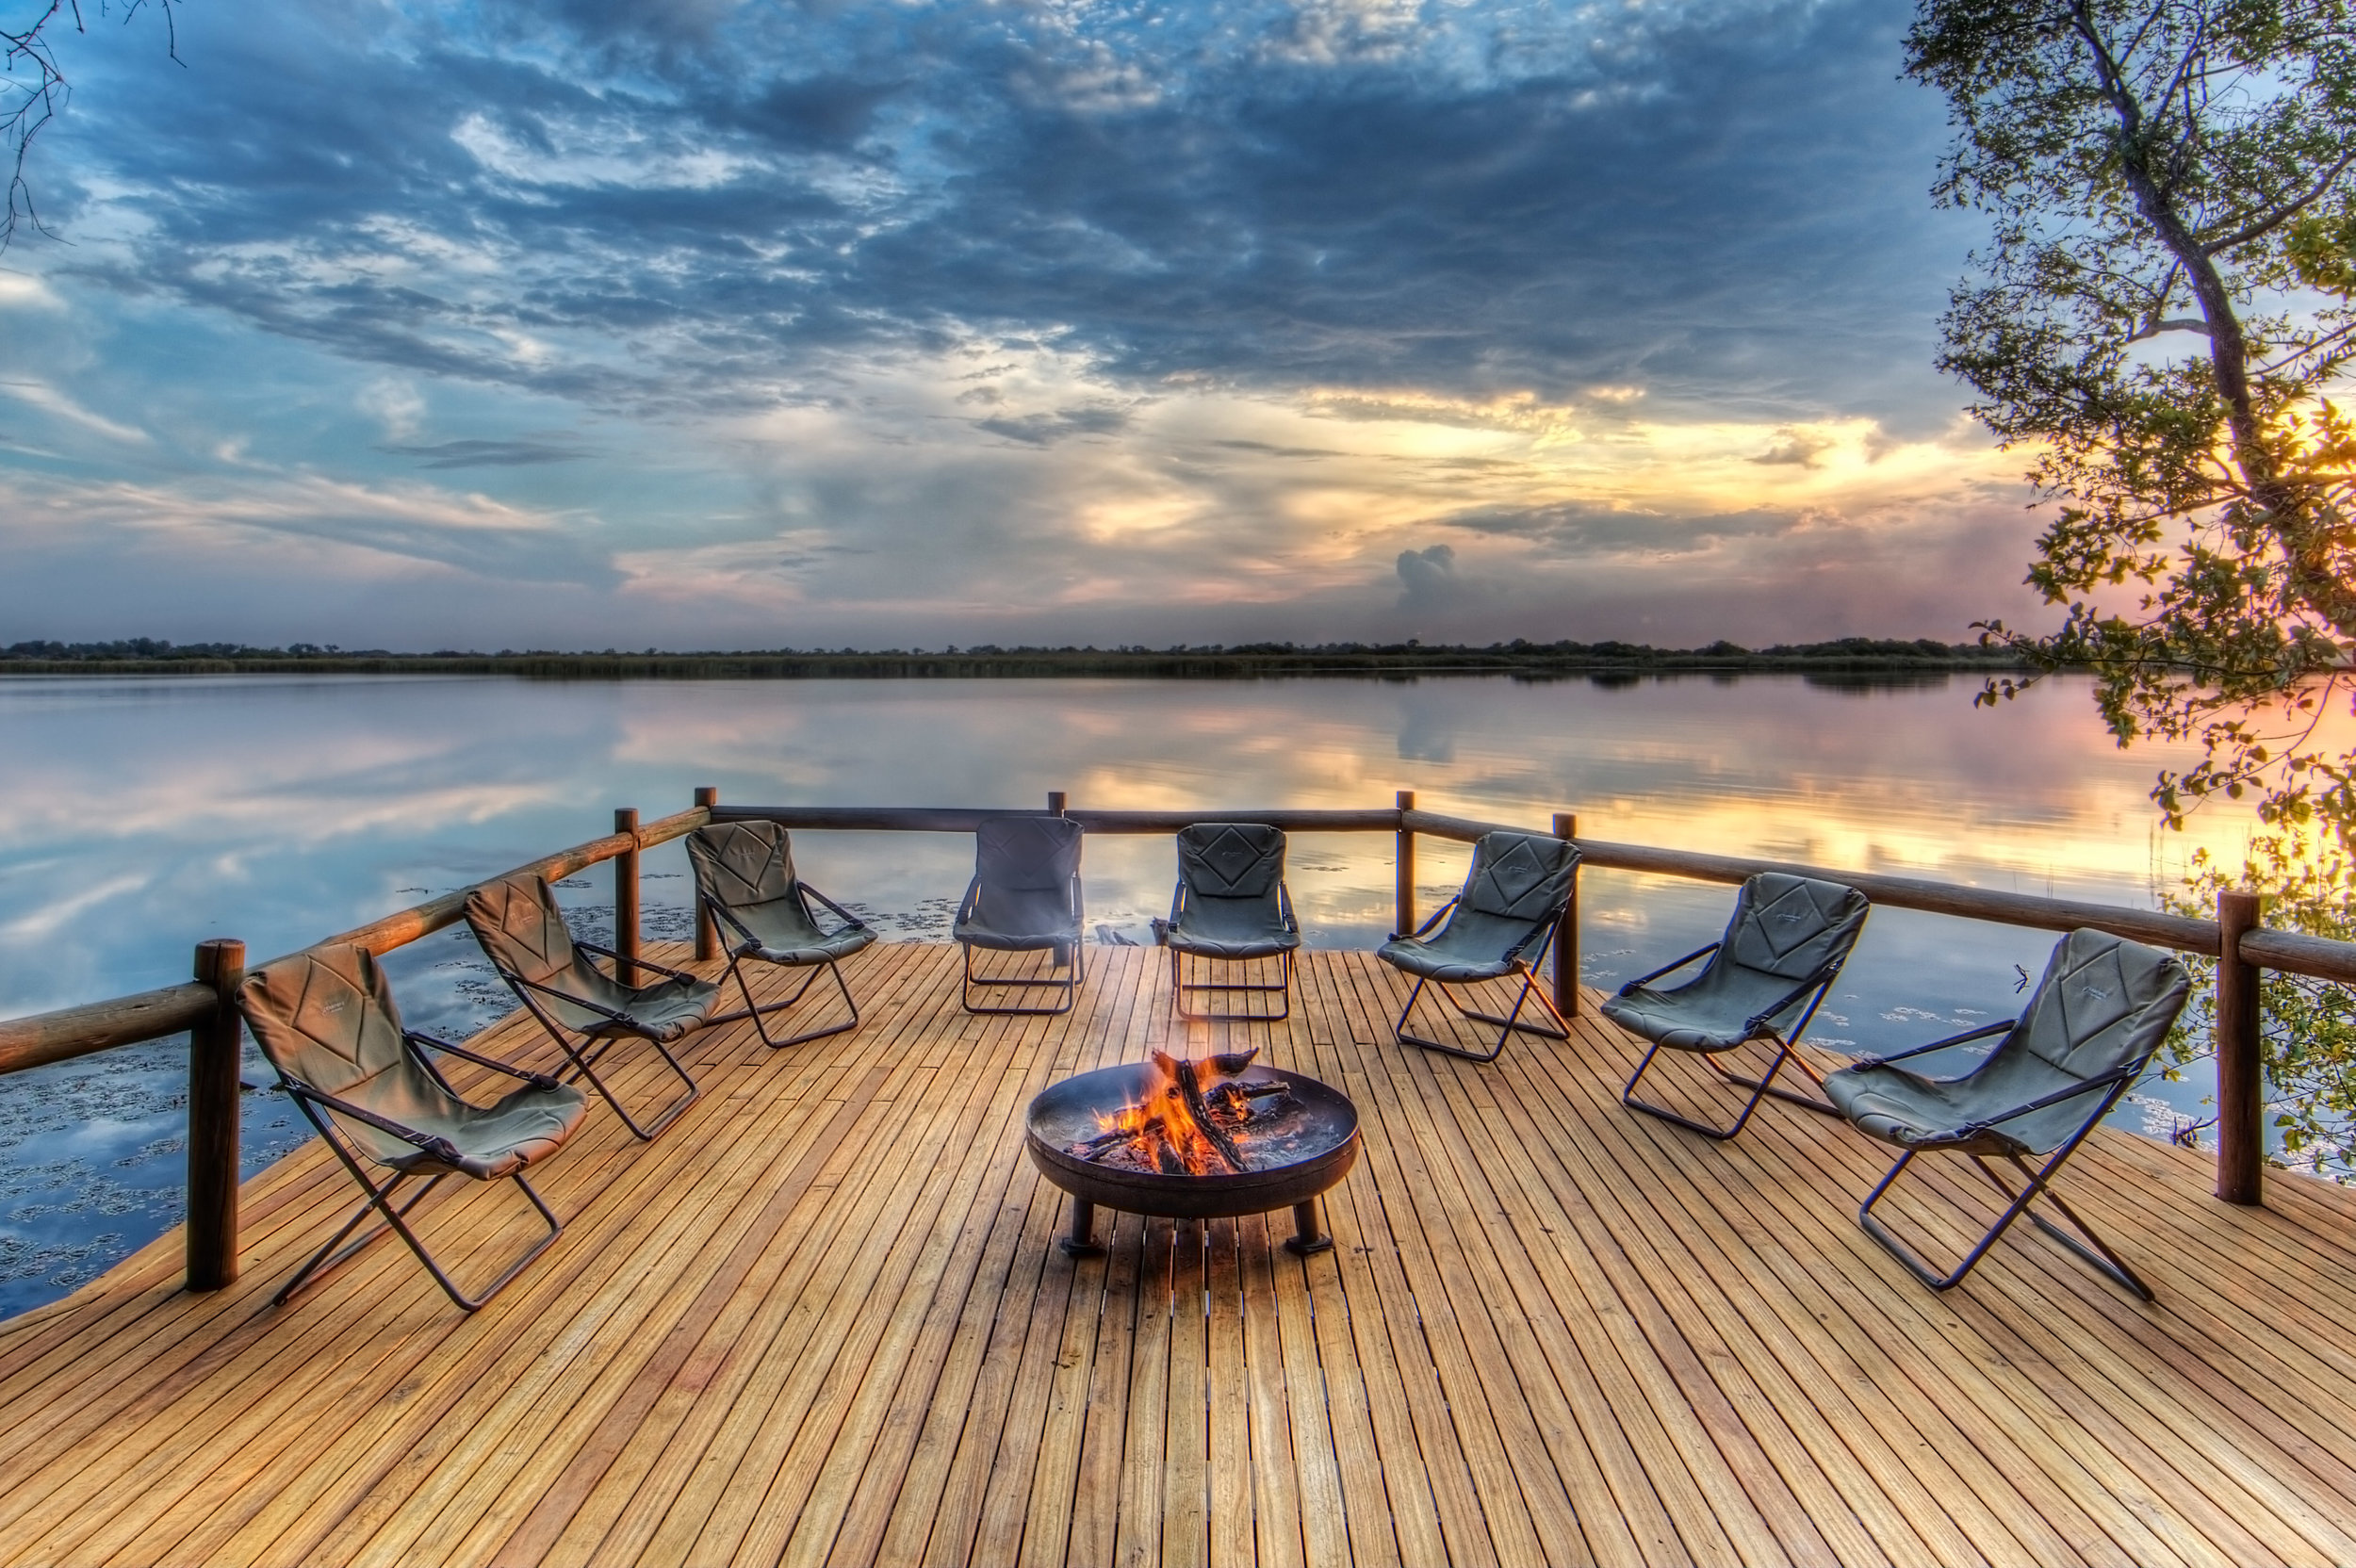 xugana-island-lodge-fire-deck1.jpg